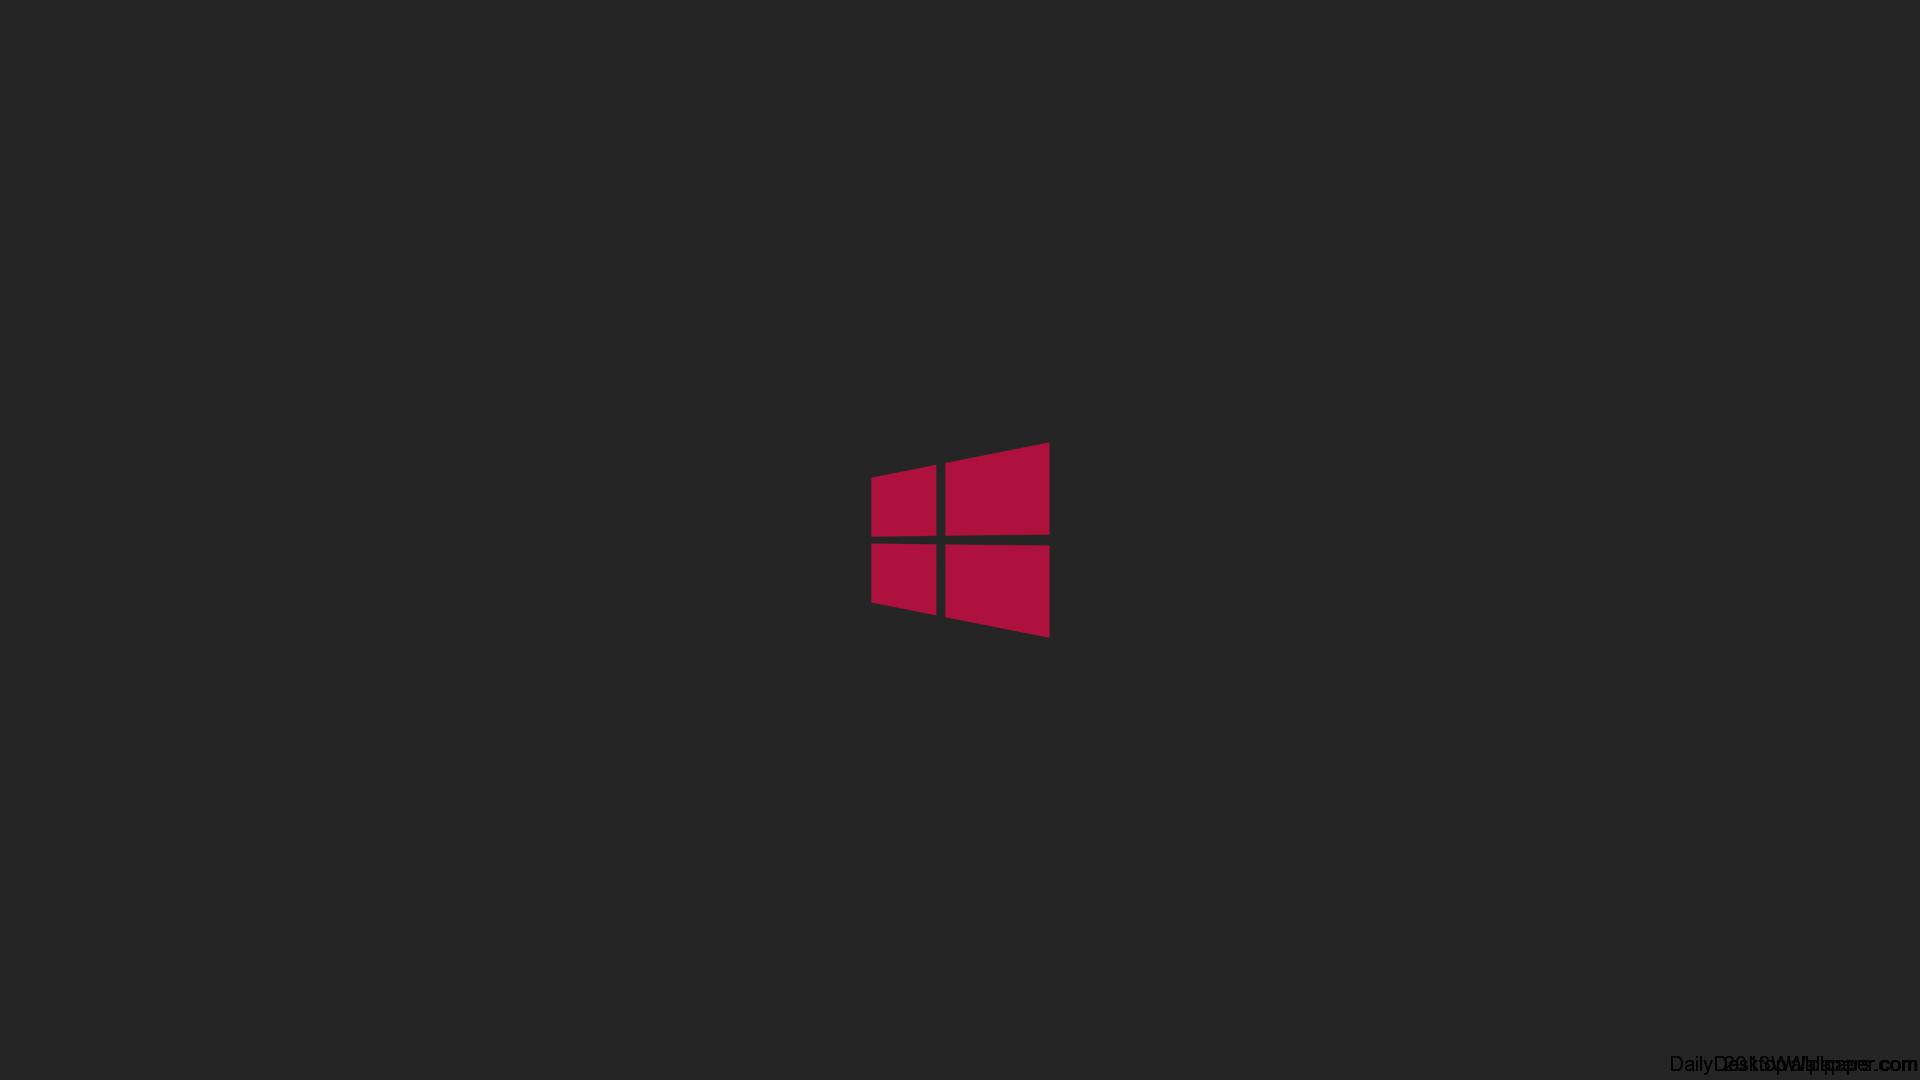 Free Sports Logo Image Hd Wallpapers Windows Amazing 4k: Windows 10 Logo HD Wallpaper (74+ Images